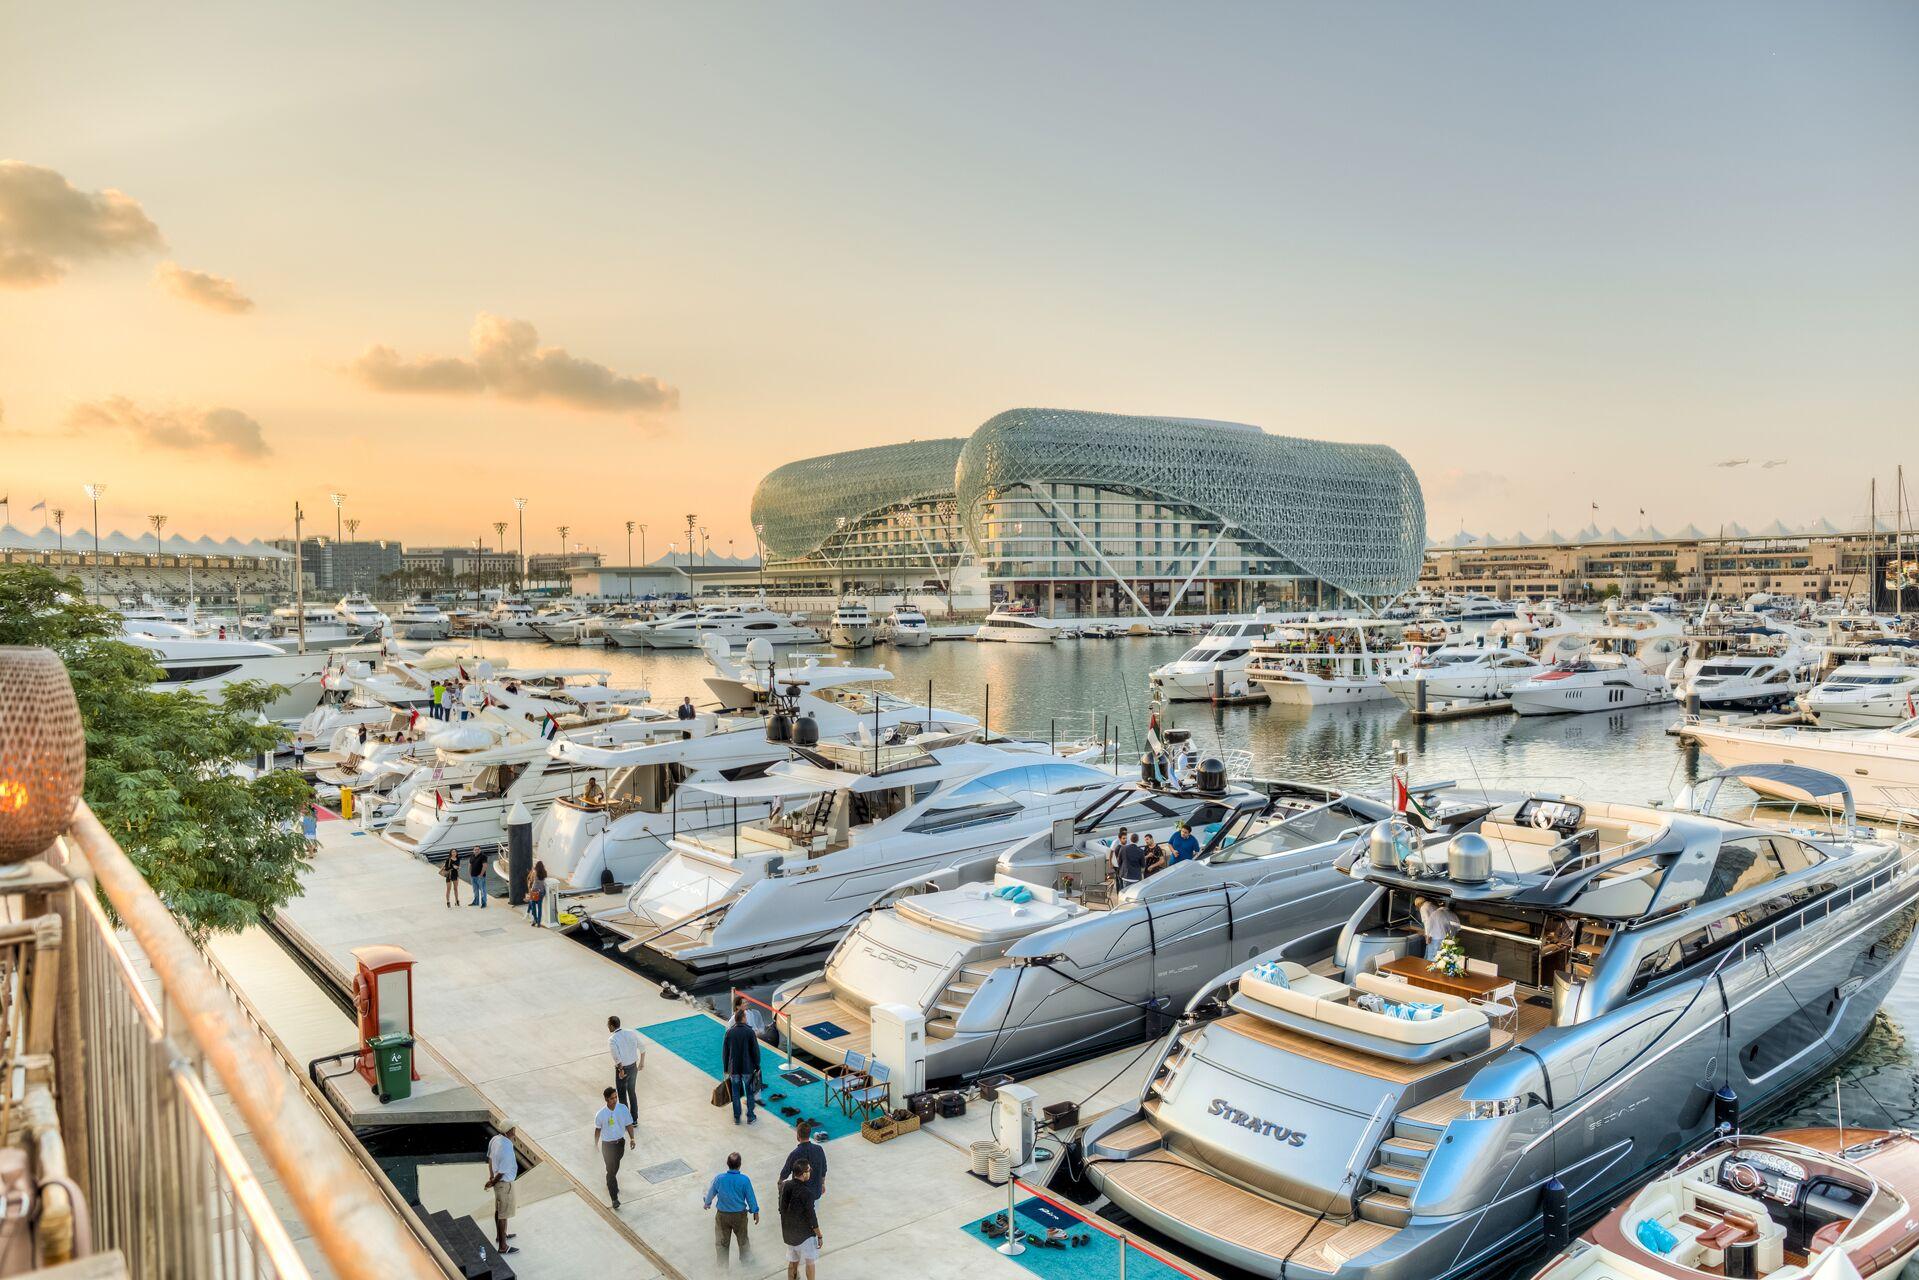 Yas Marina prepares for Formula 1 Grand Prix - Yacht Harbour